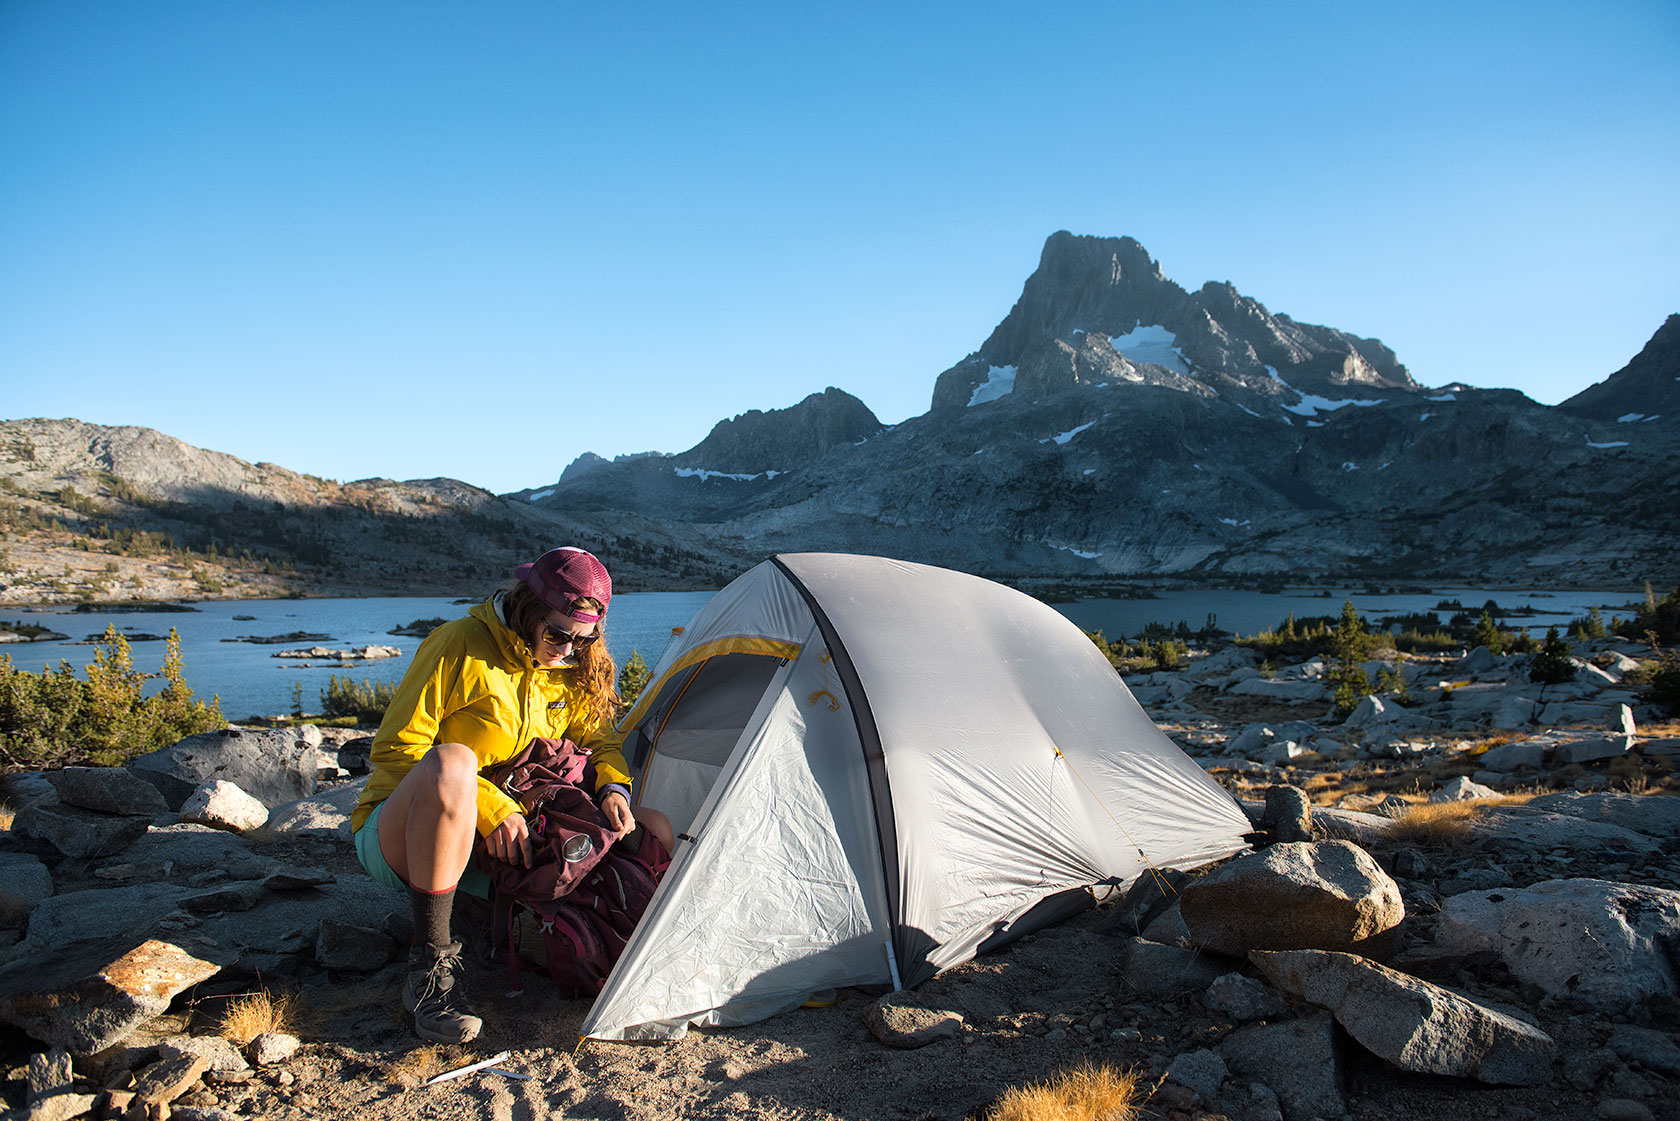 austin-trigg-big-agnes-tent-john-muir-trail-camping-Unpack-FlyCreek-thousand-Island-Lake-sunset.jpg